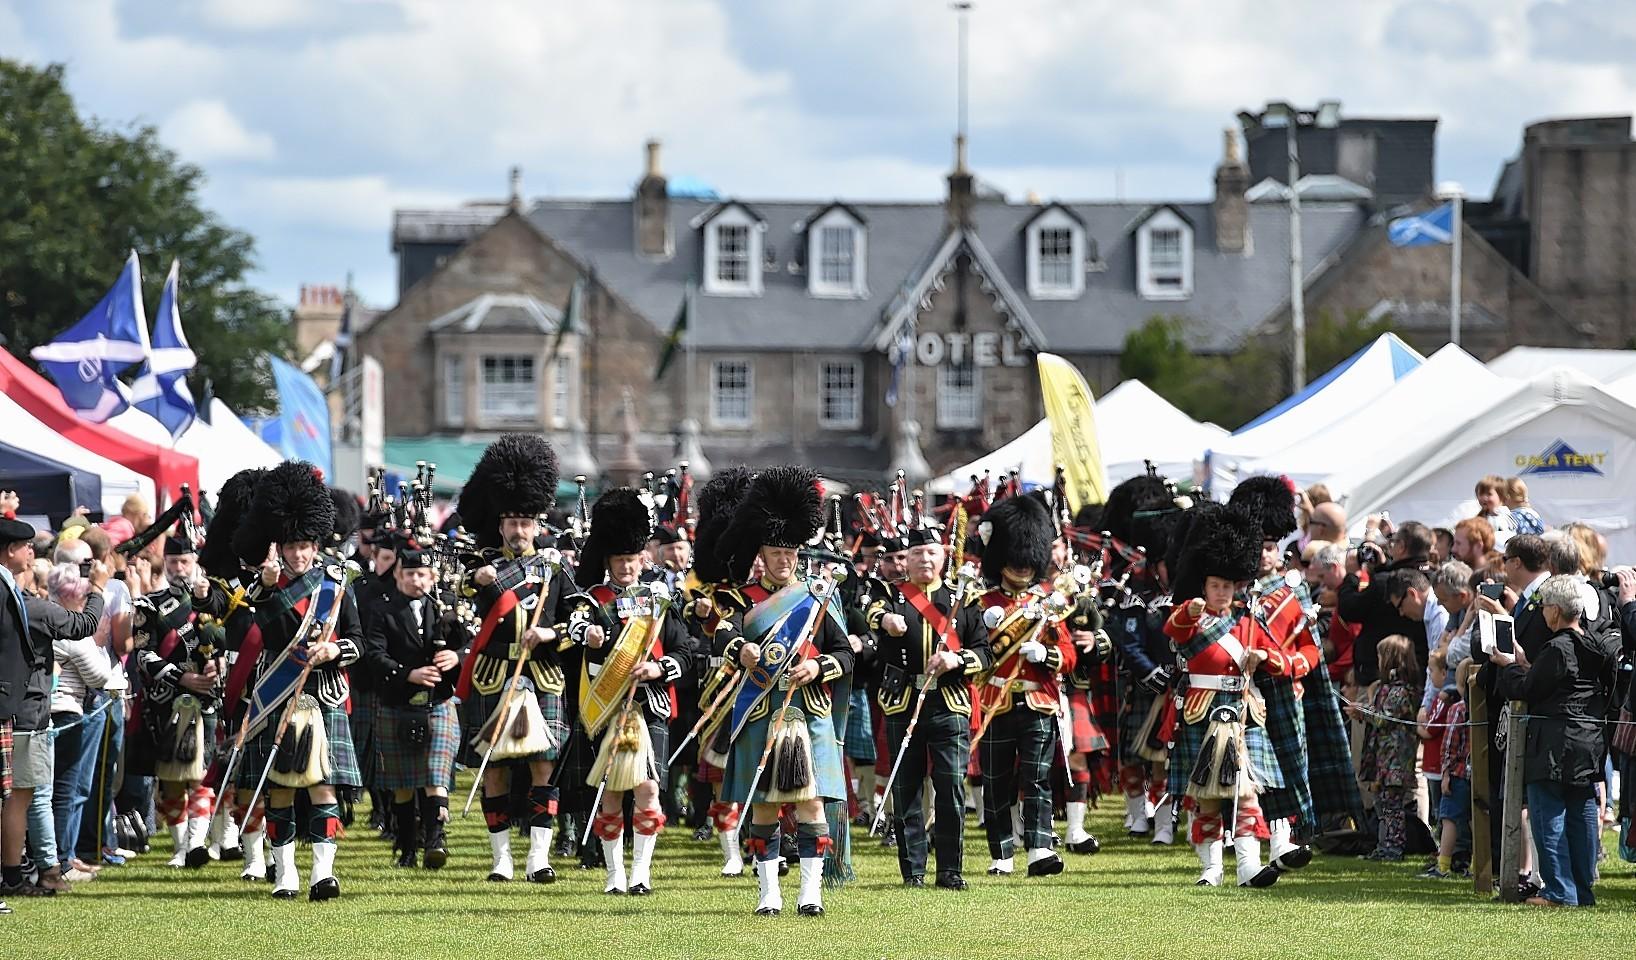 Bobbies will become a rarer sight at Highland games